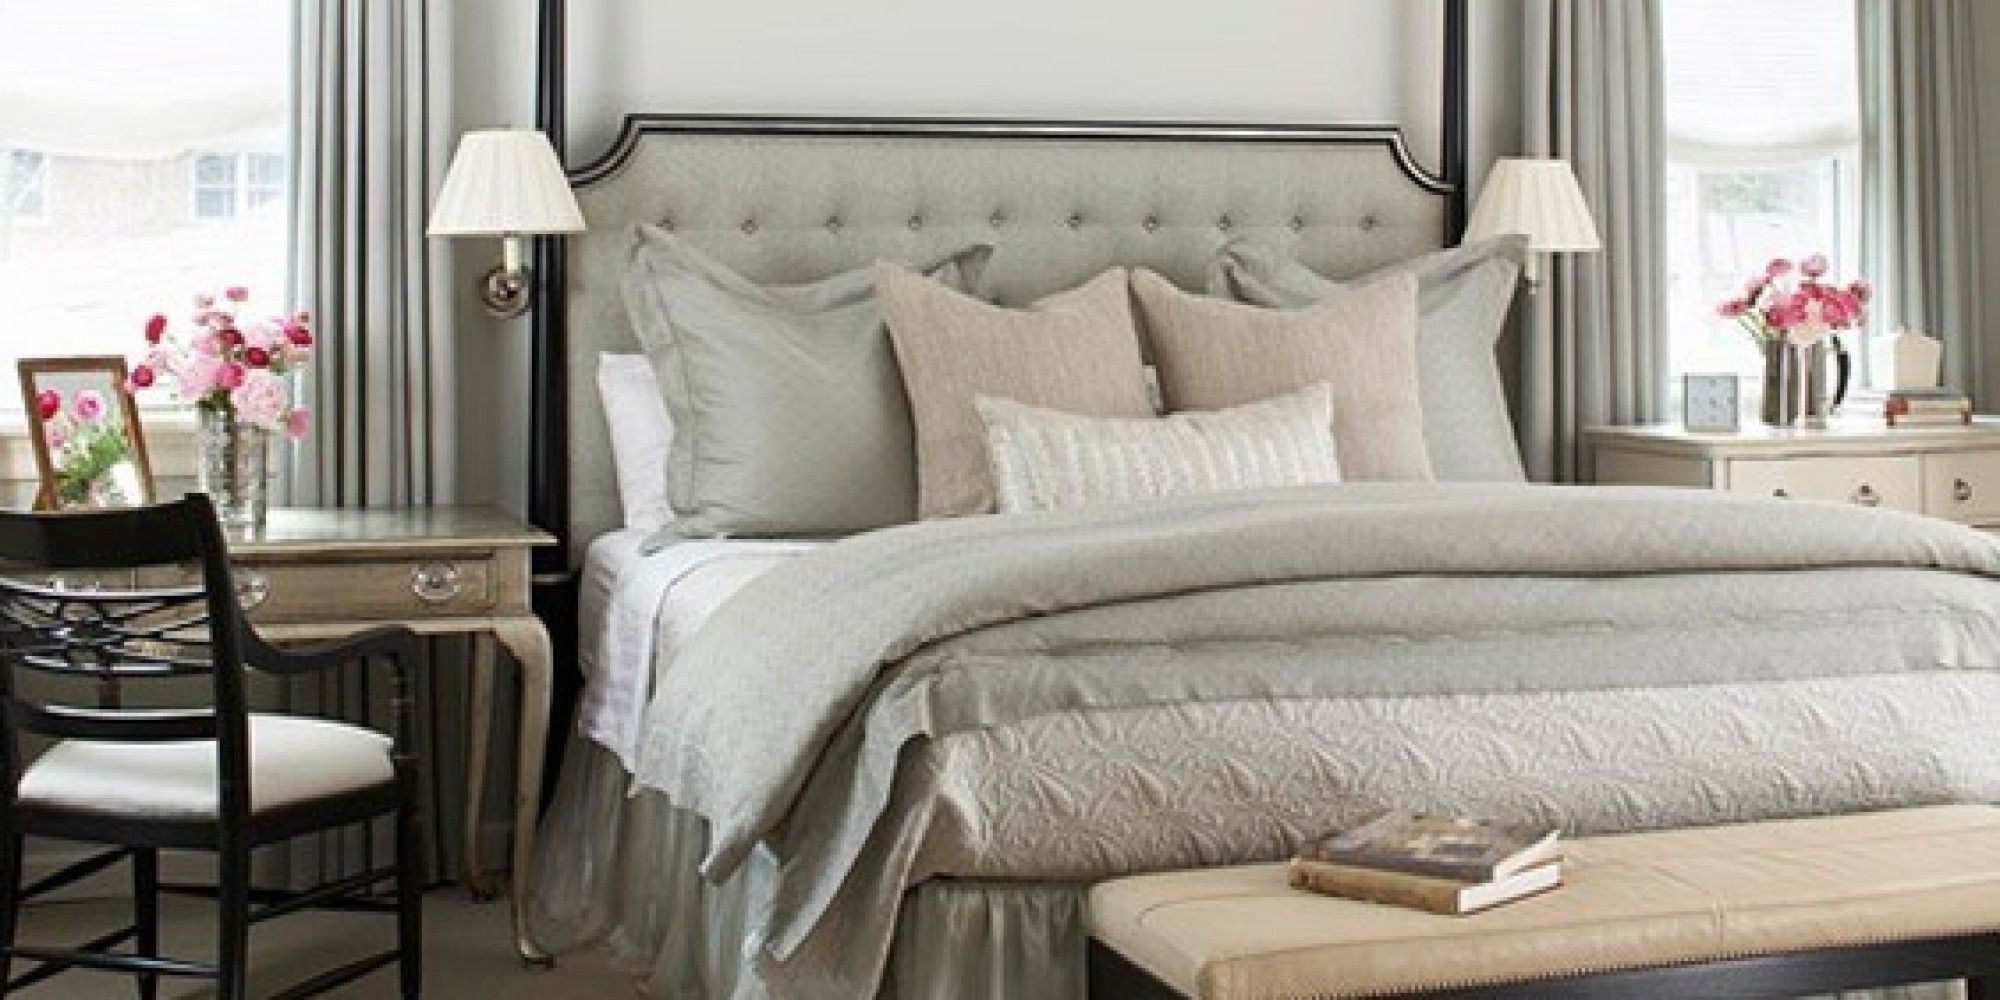 4 room master bedroom design  mismatched nightstands  Google Search  Master bedroom  Pinterest